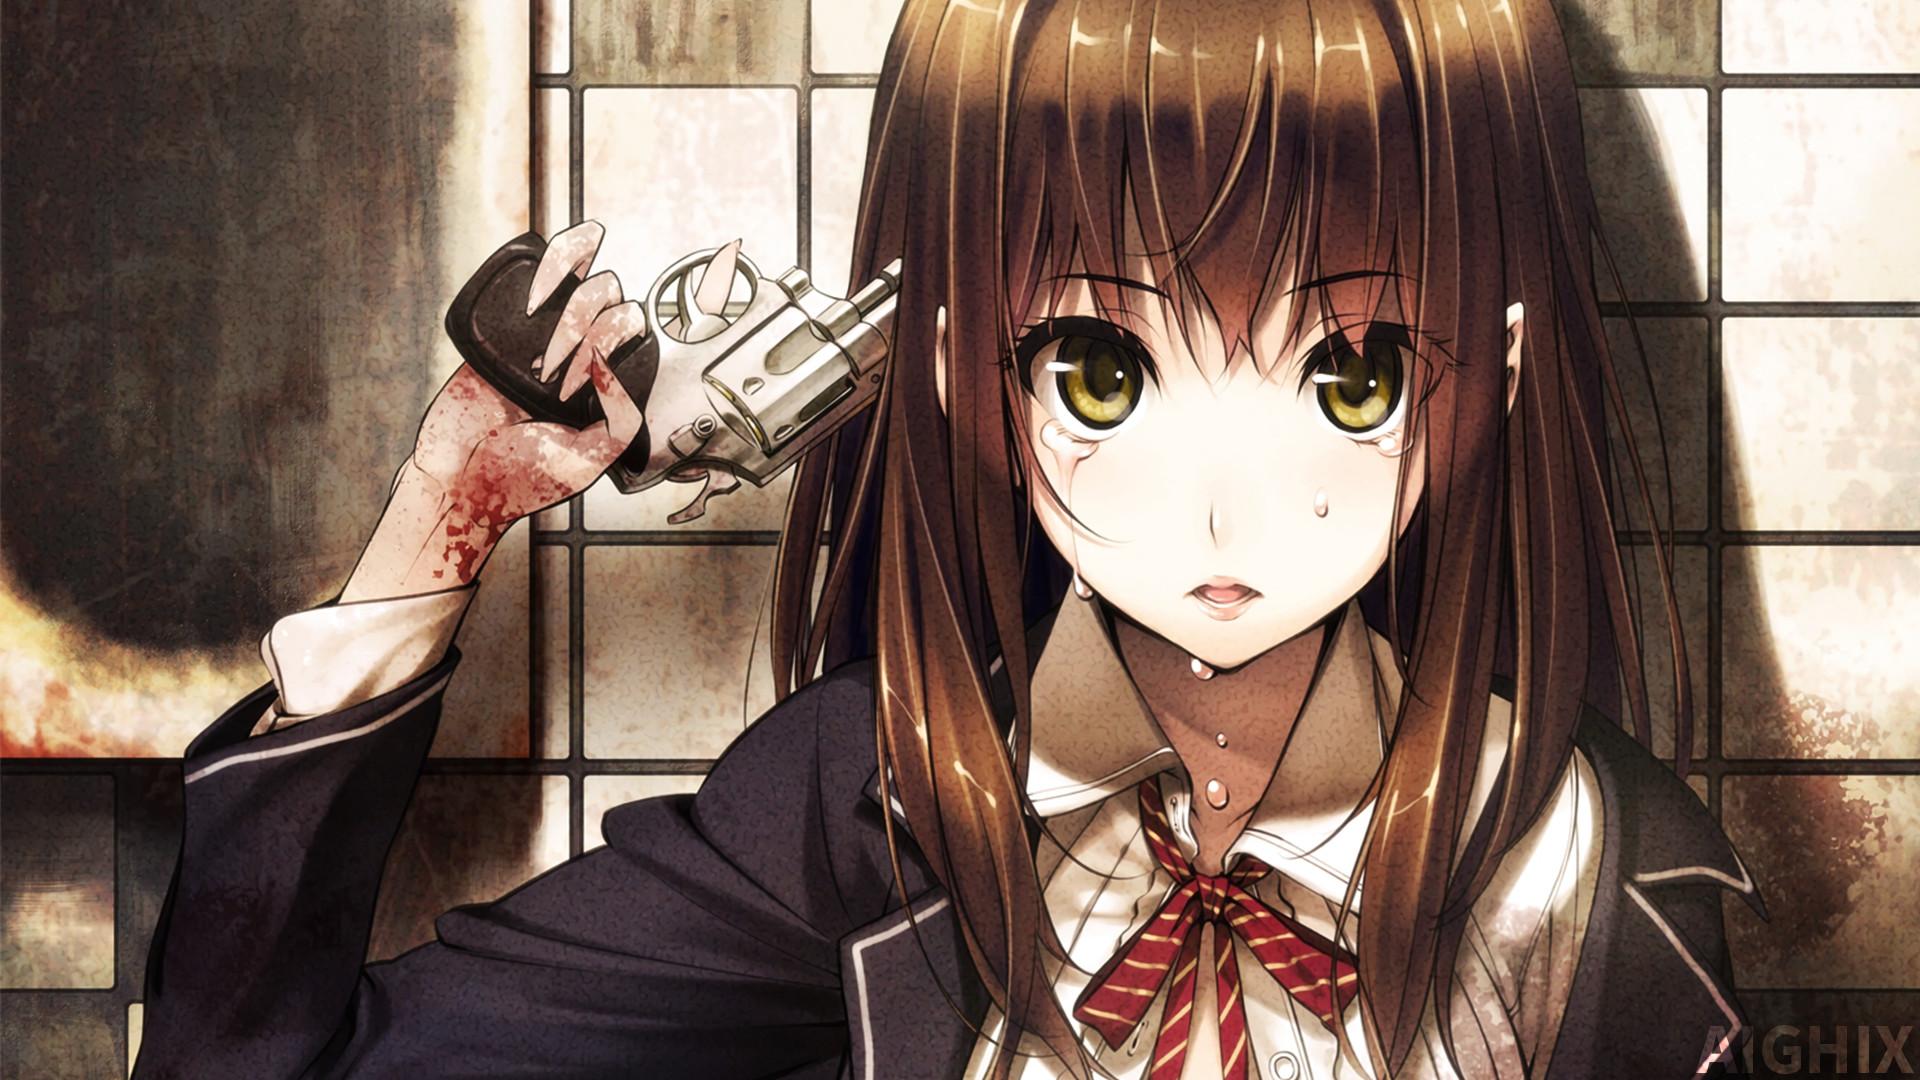 Sad Anime Wallpaper (64+ Images